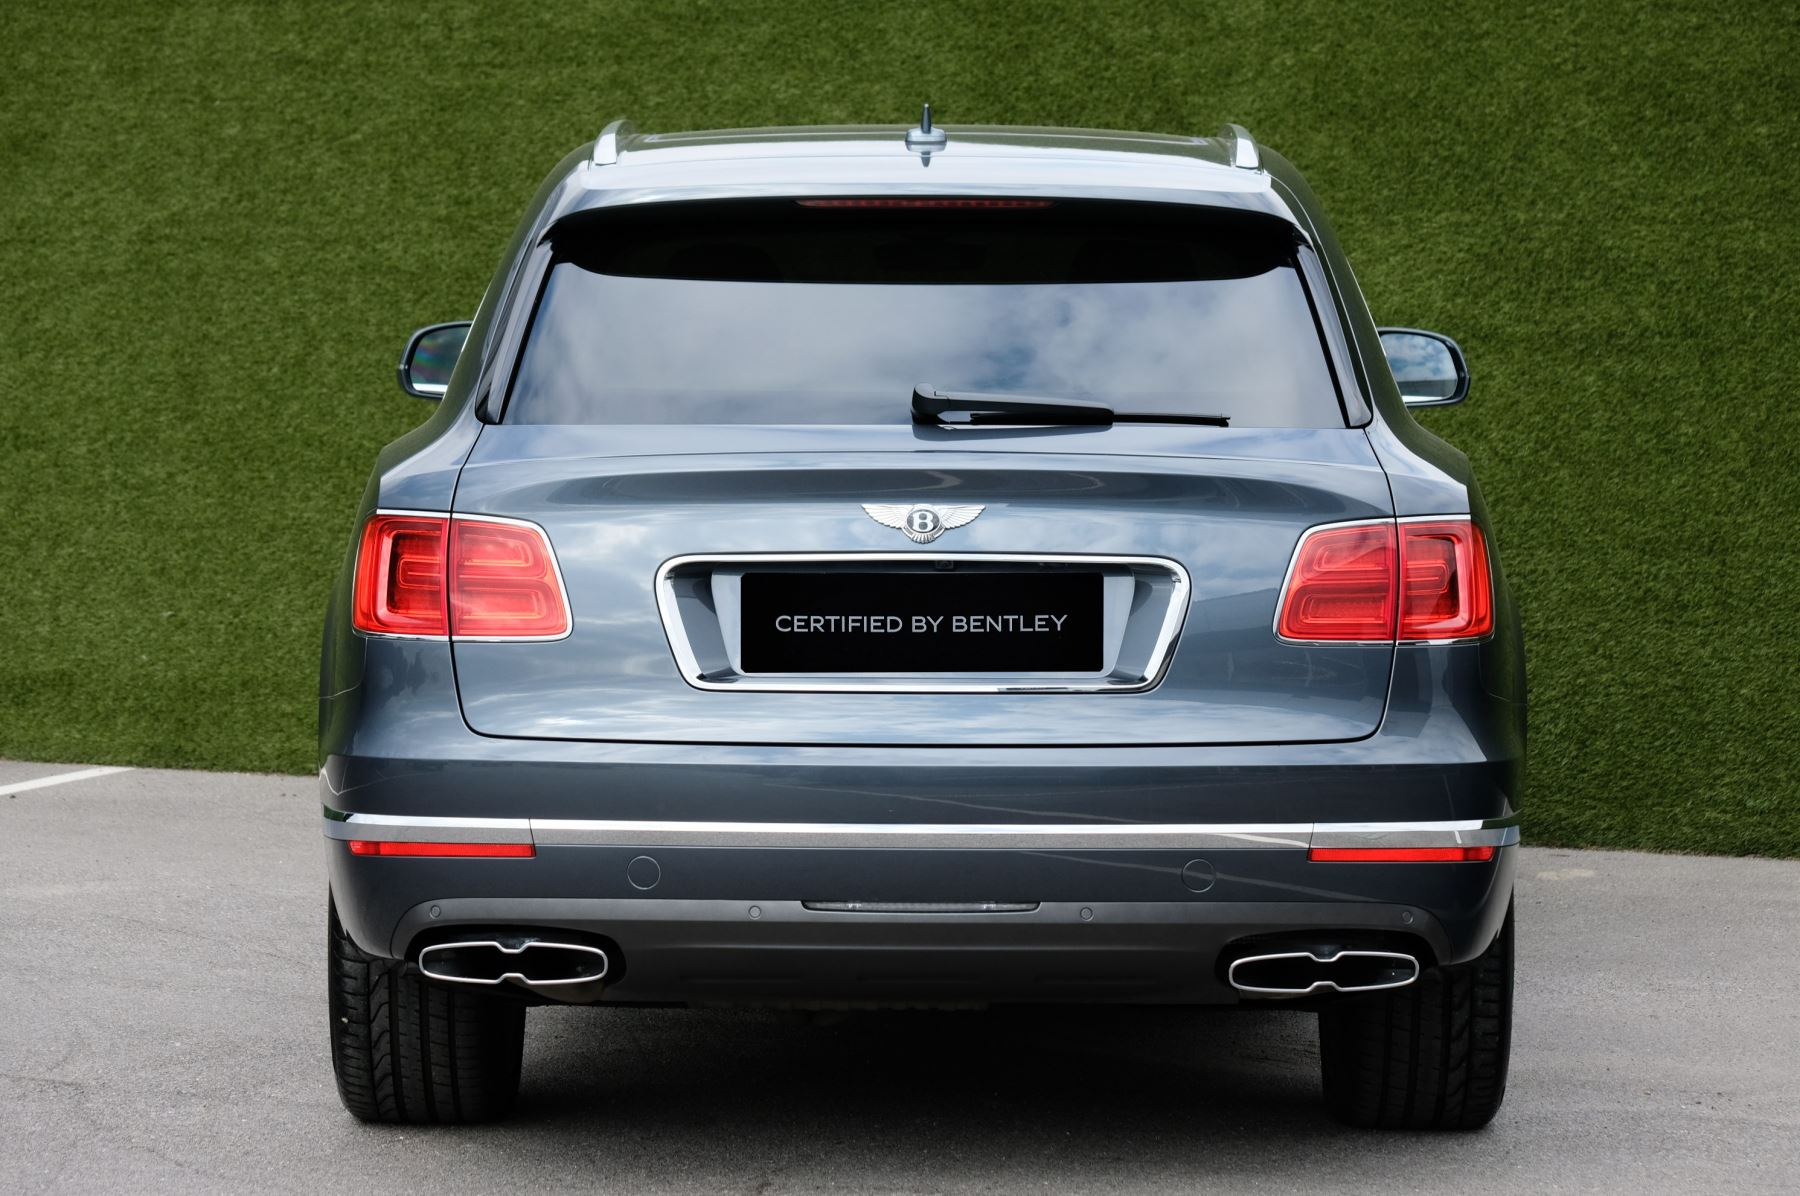 Bentley Bentayga 4.0 V8 5dr - Mulliner Driving Specification - City & Tour Specification image 4